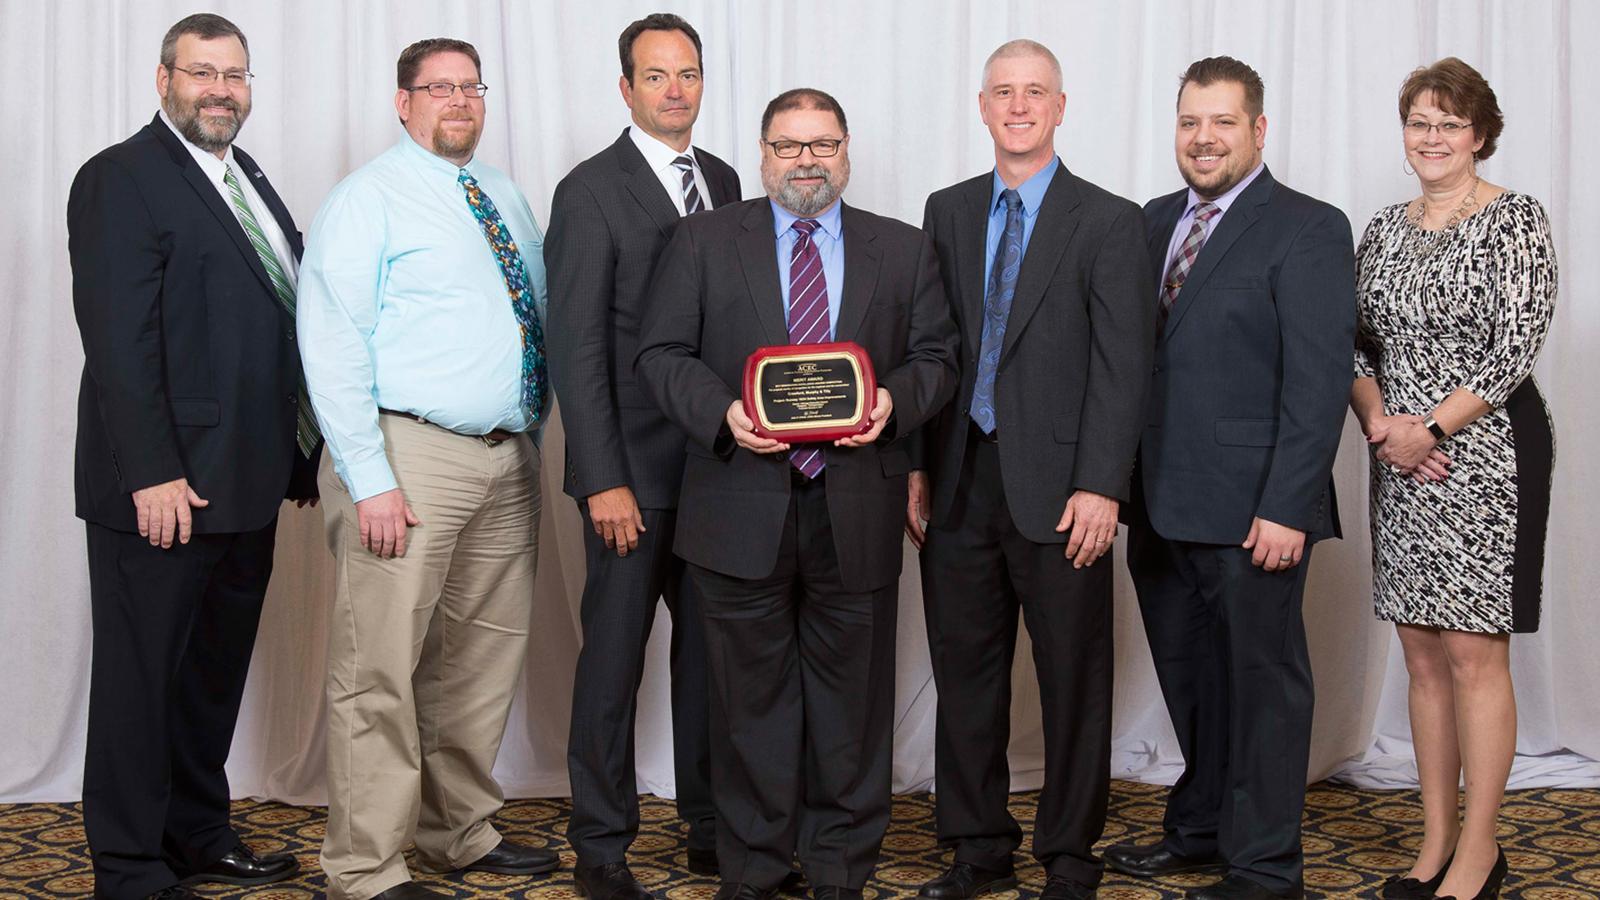 ACEC Illinois Merit Award for Chicago Executive